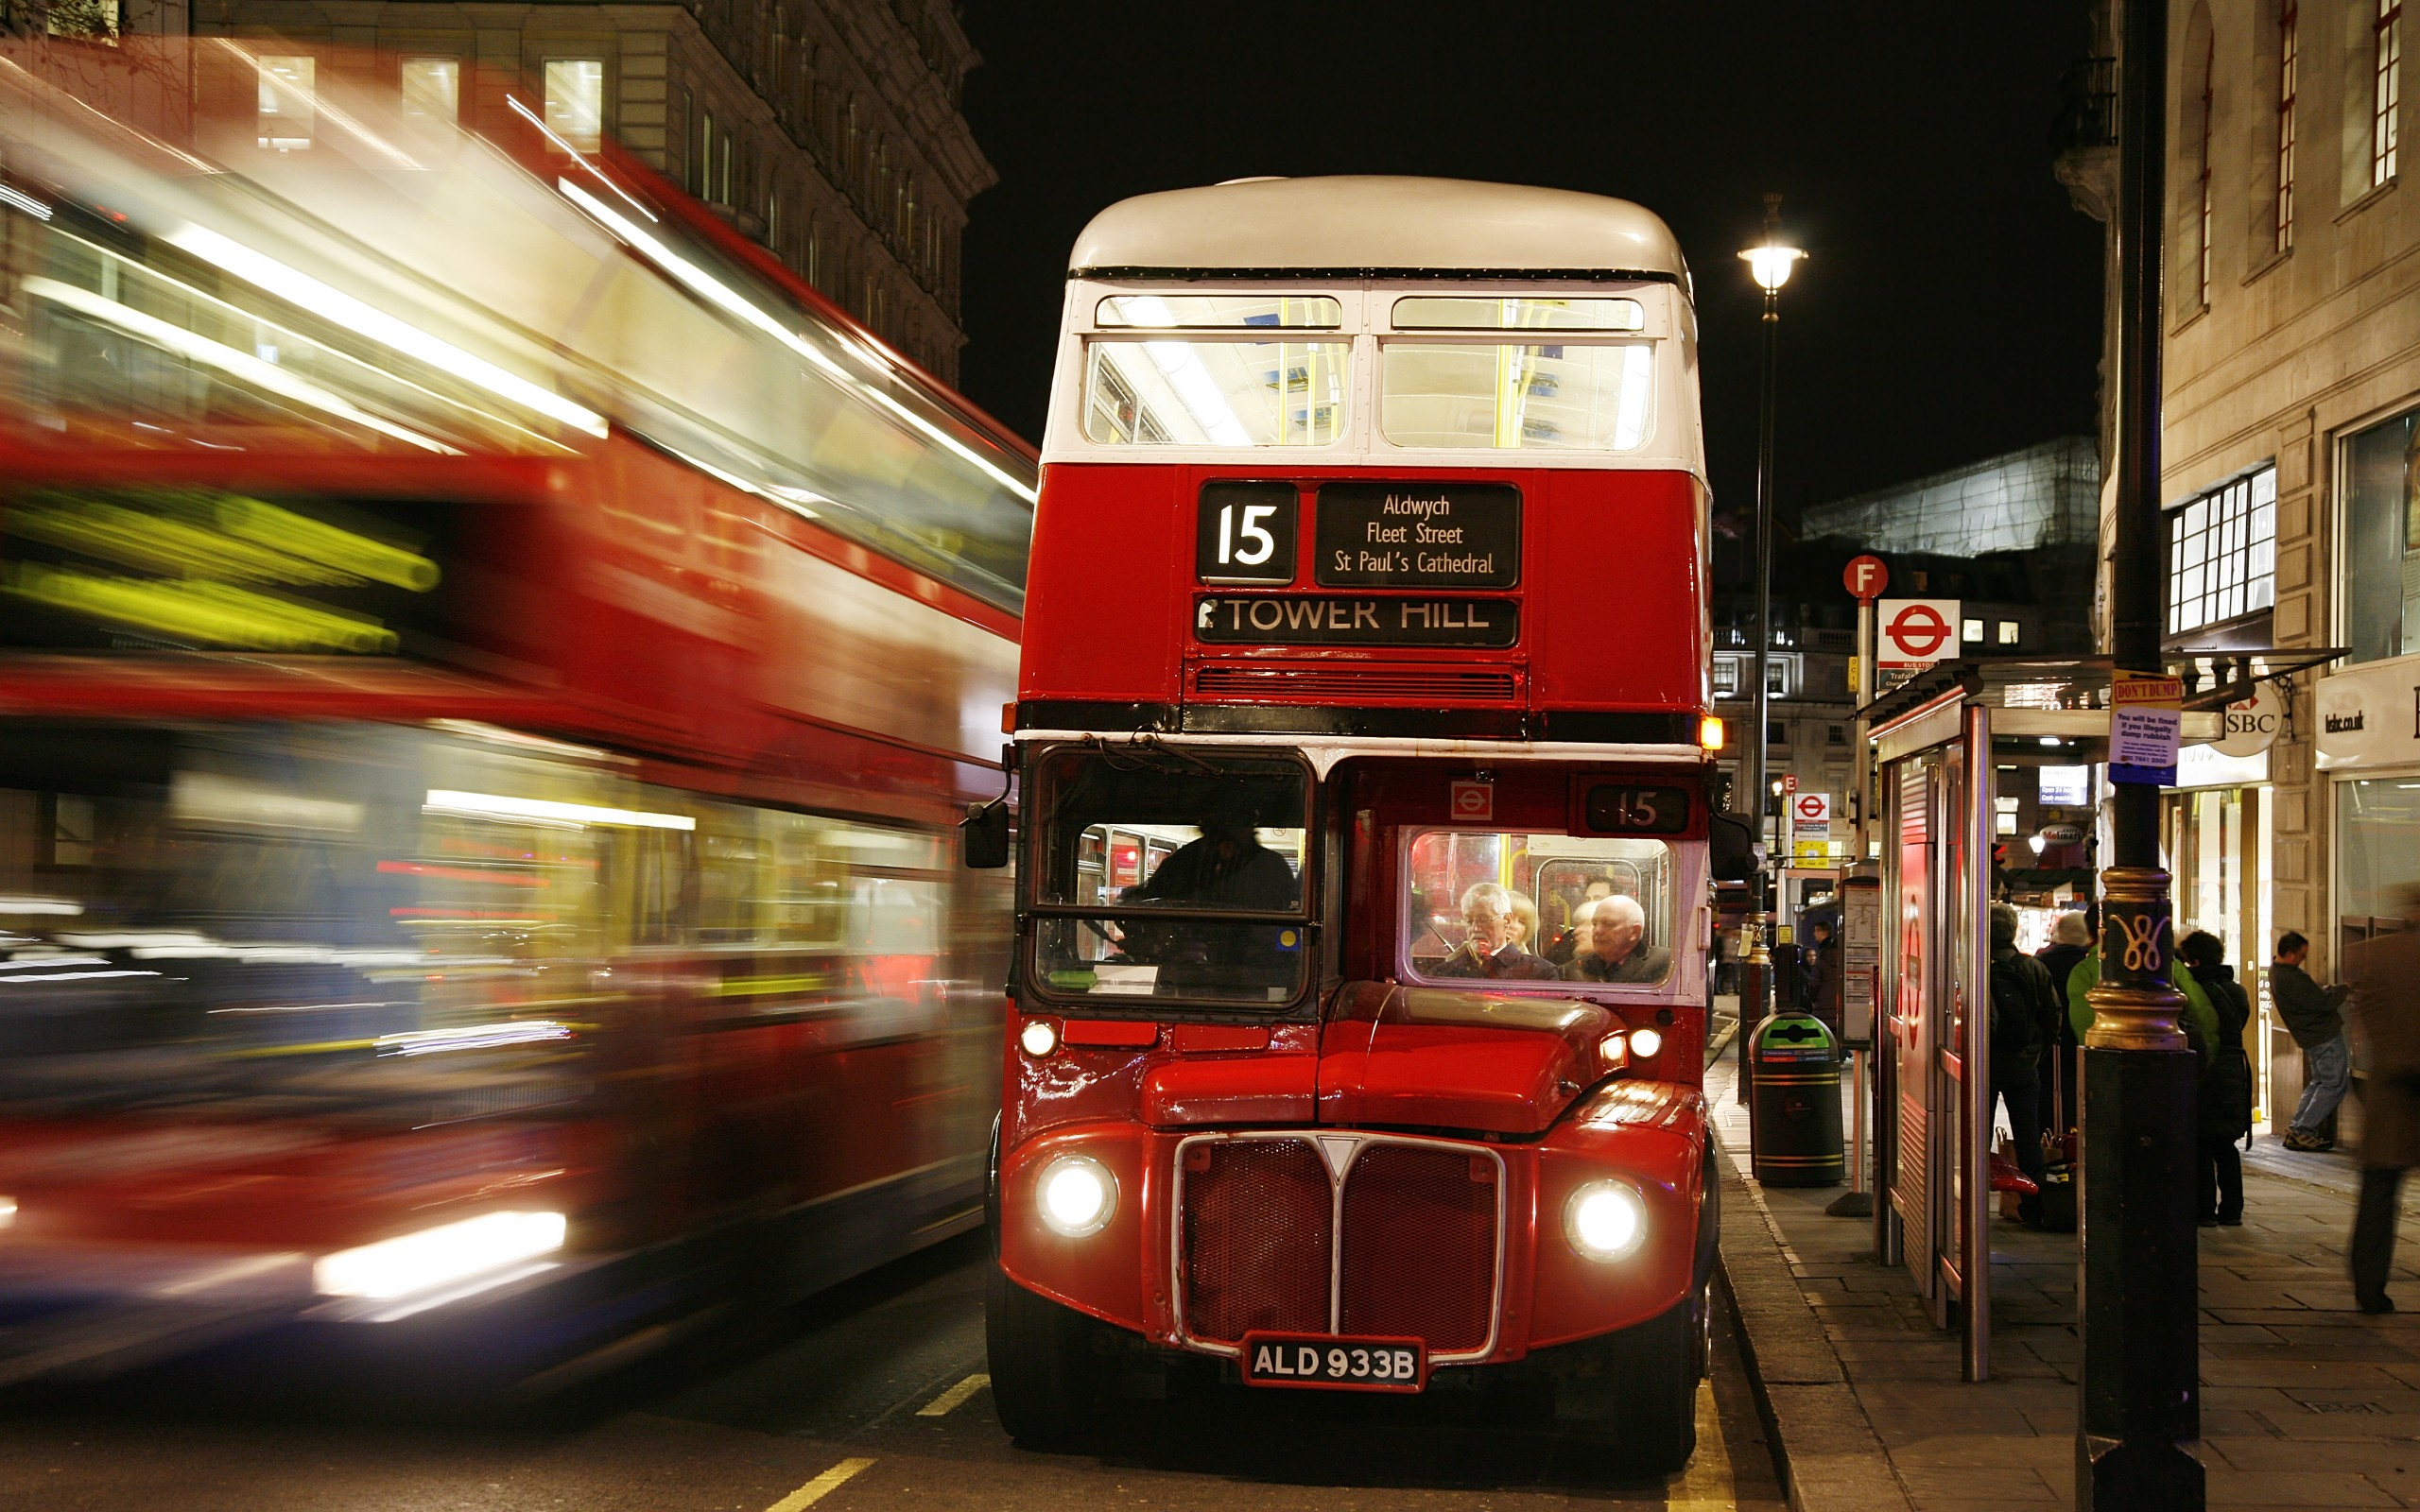 london england bus night lights people blur Passengers driver street 2560x1600